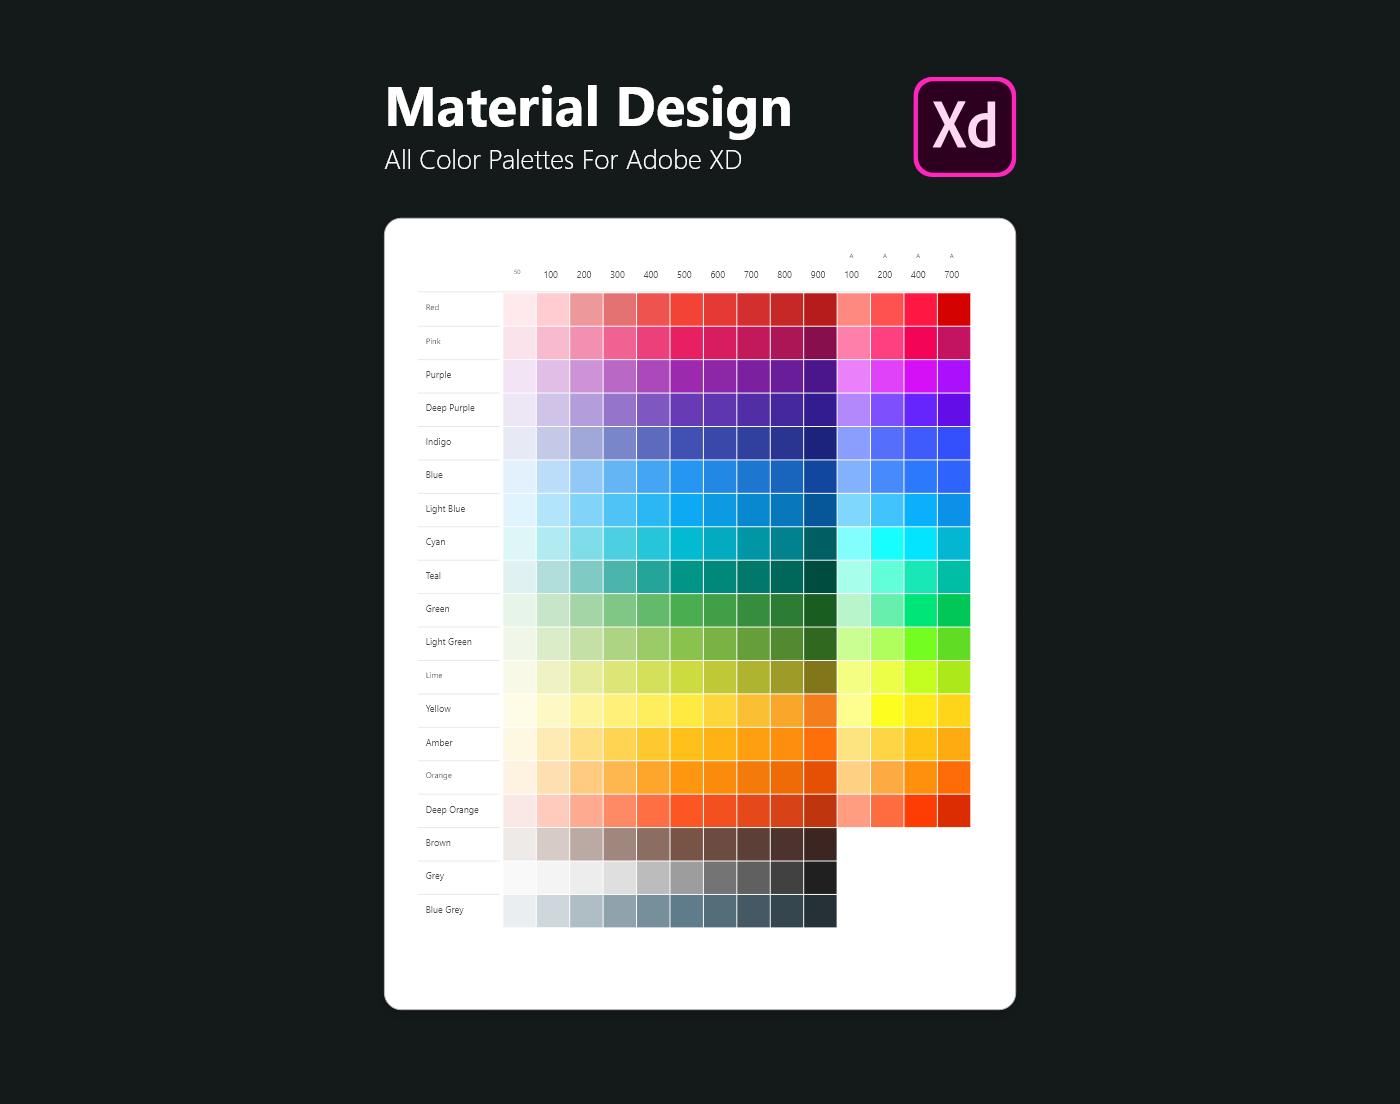 Material design color palettes for Adobe XD on Behance